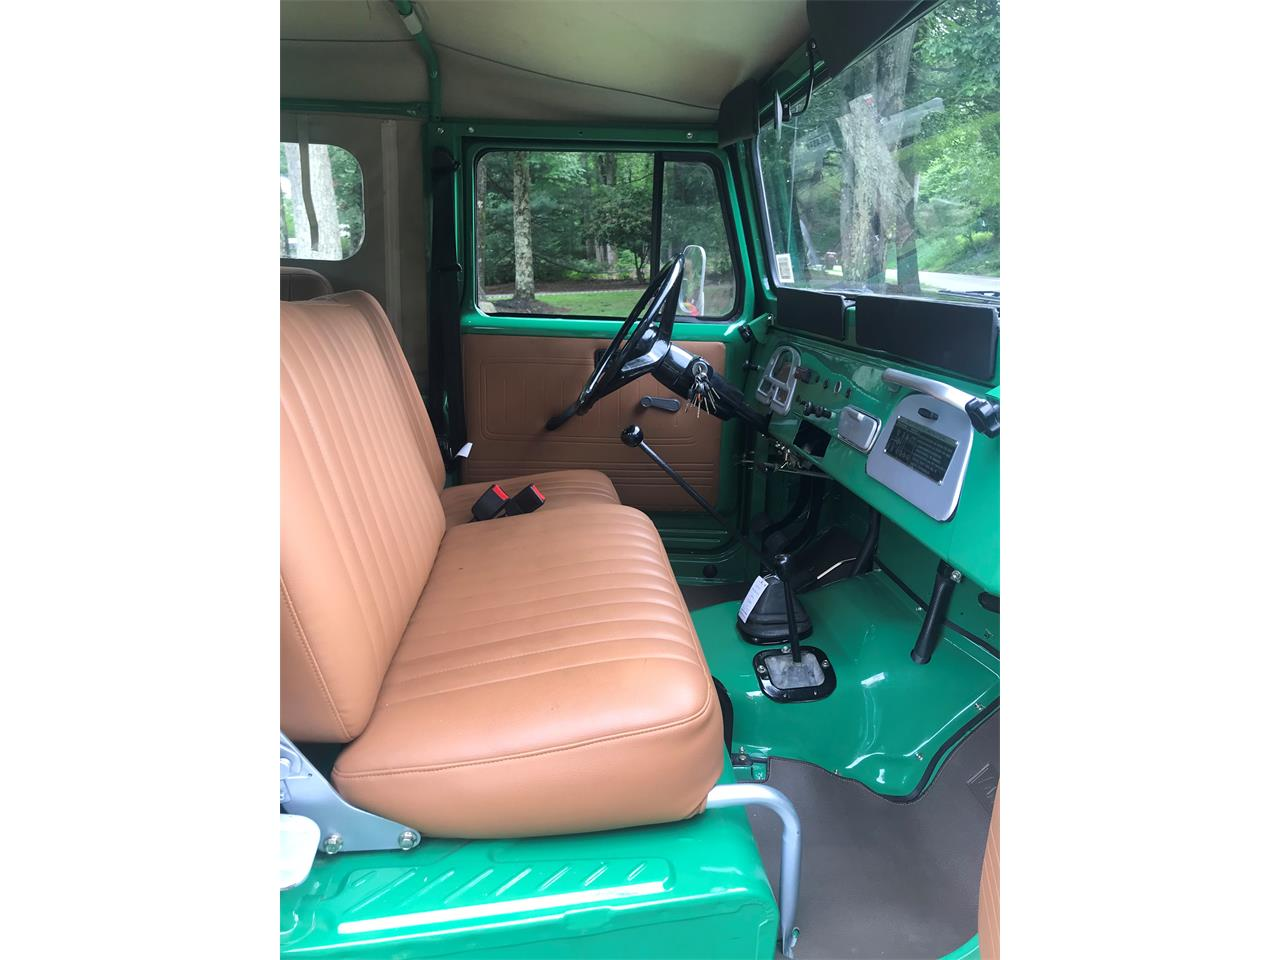 1978 Toyota Land Cruiser FJ (CC-1230445) for sale in Randolph, New Jersey